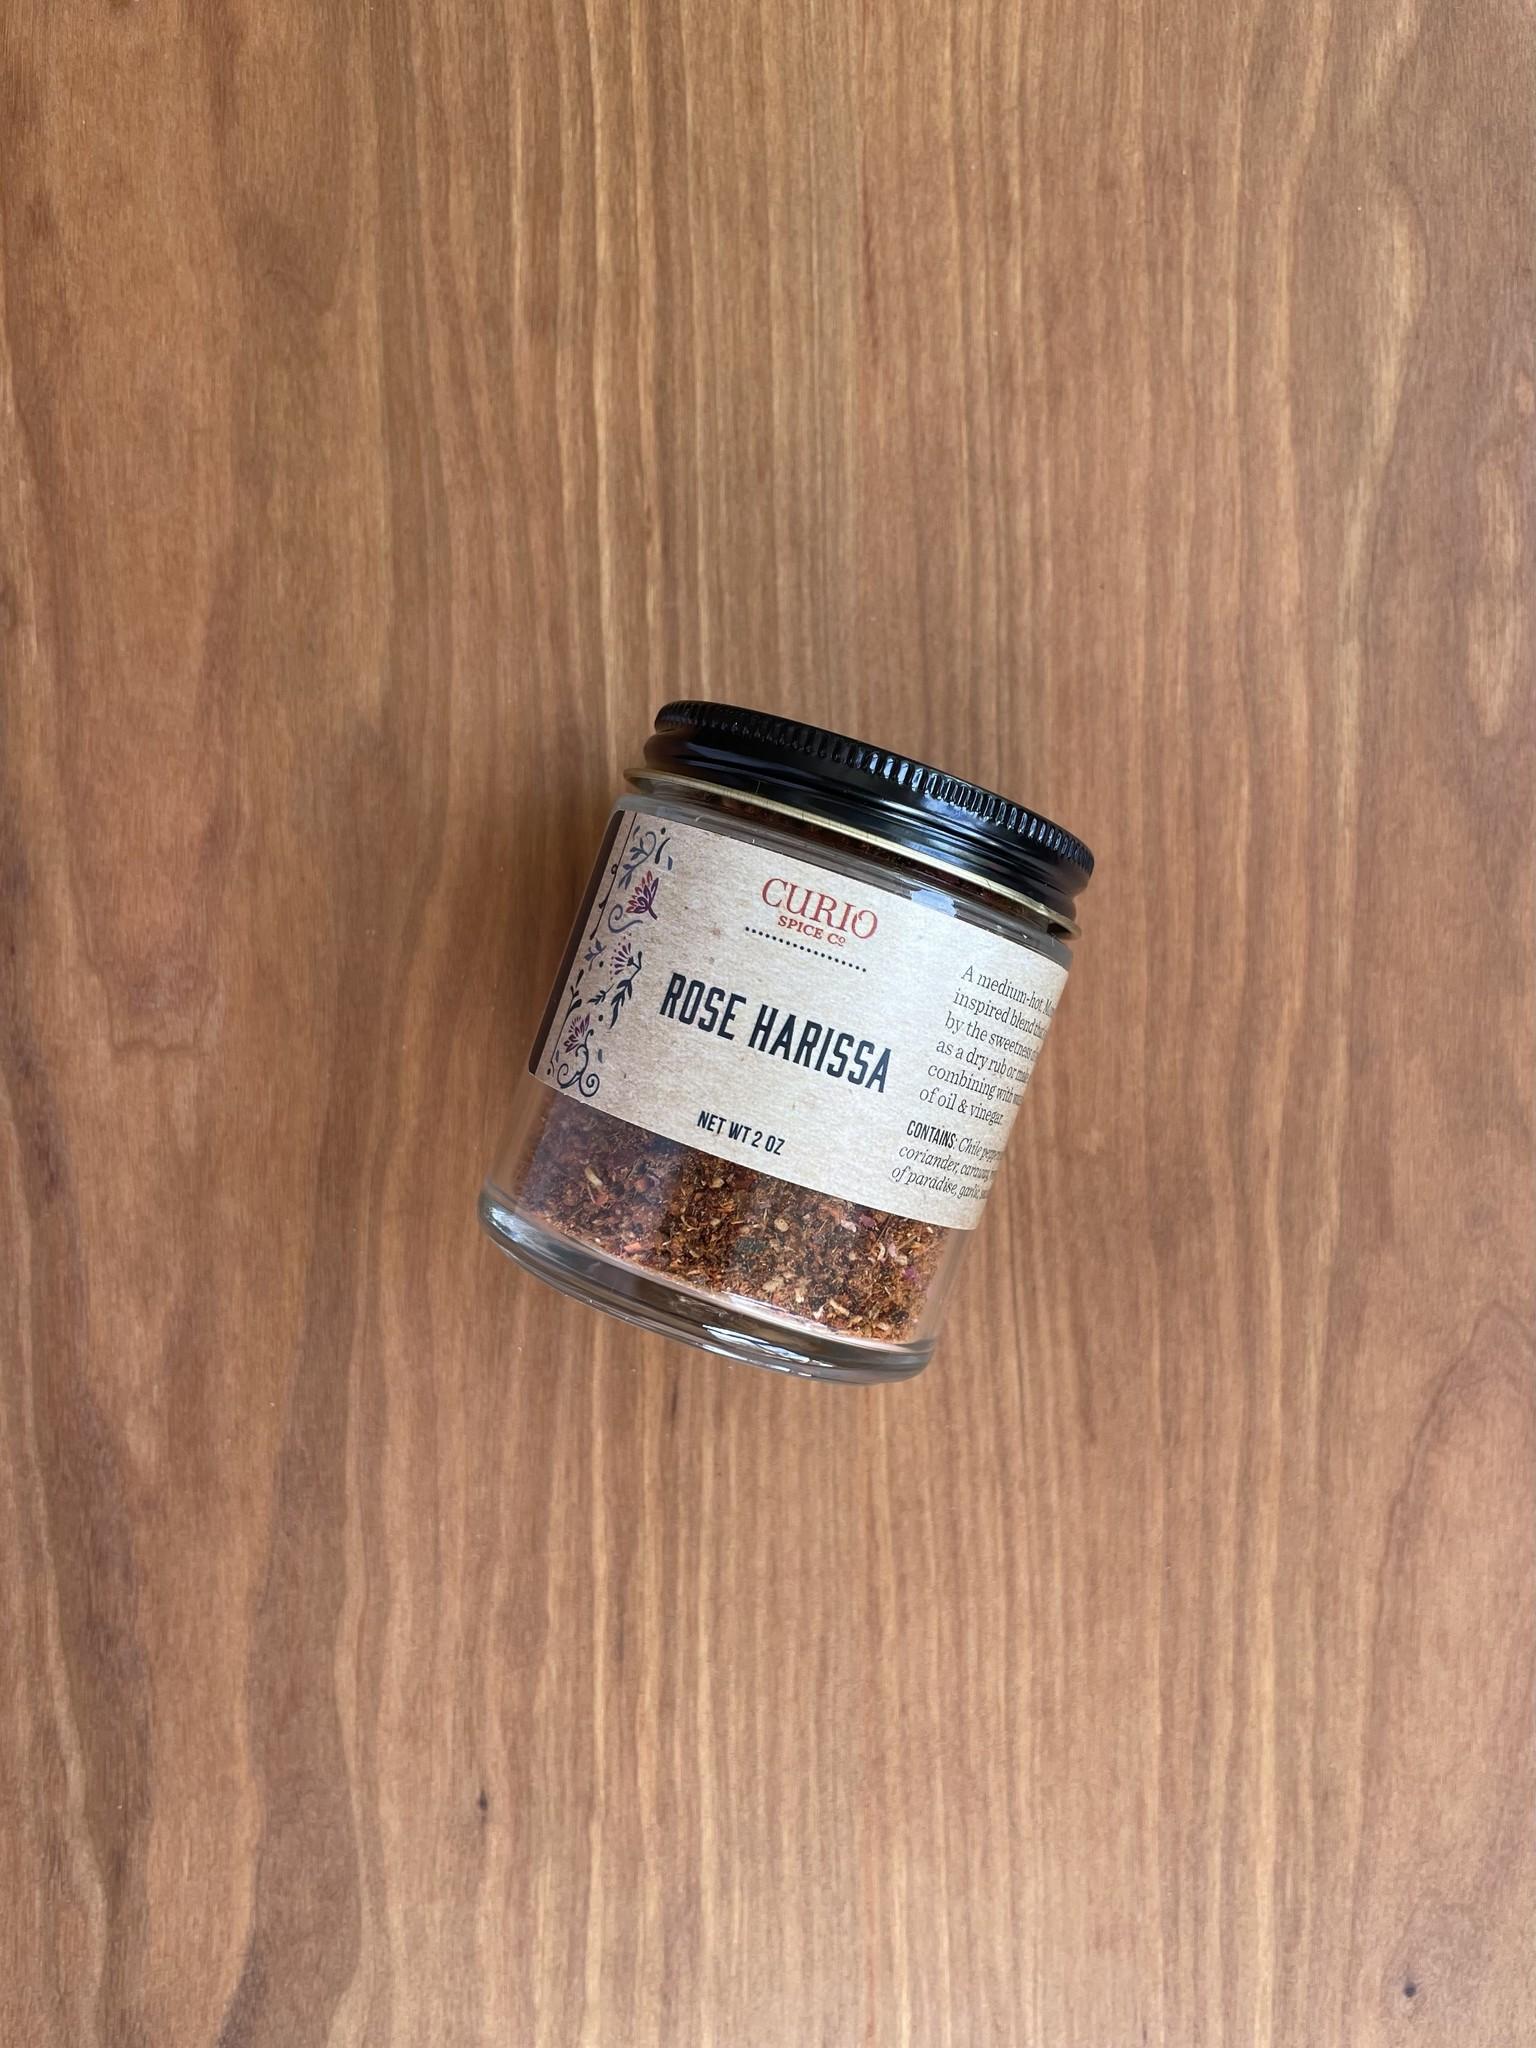 Curio Spice Co. Rose Harissa, 2 oz.-1